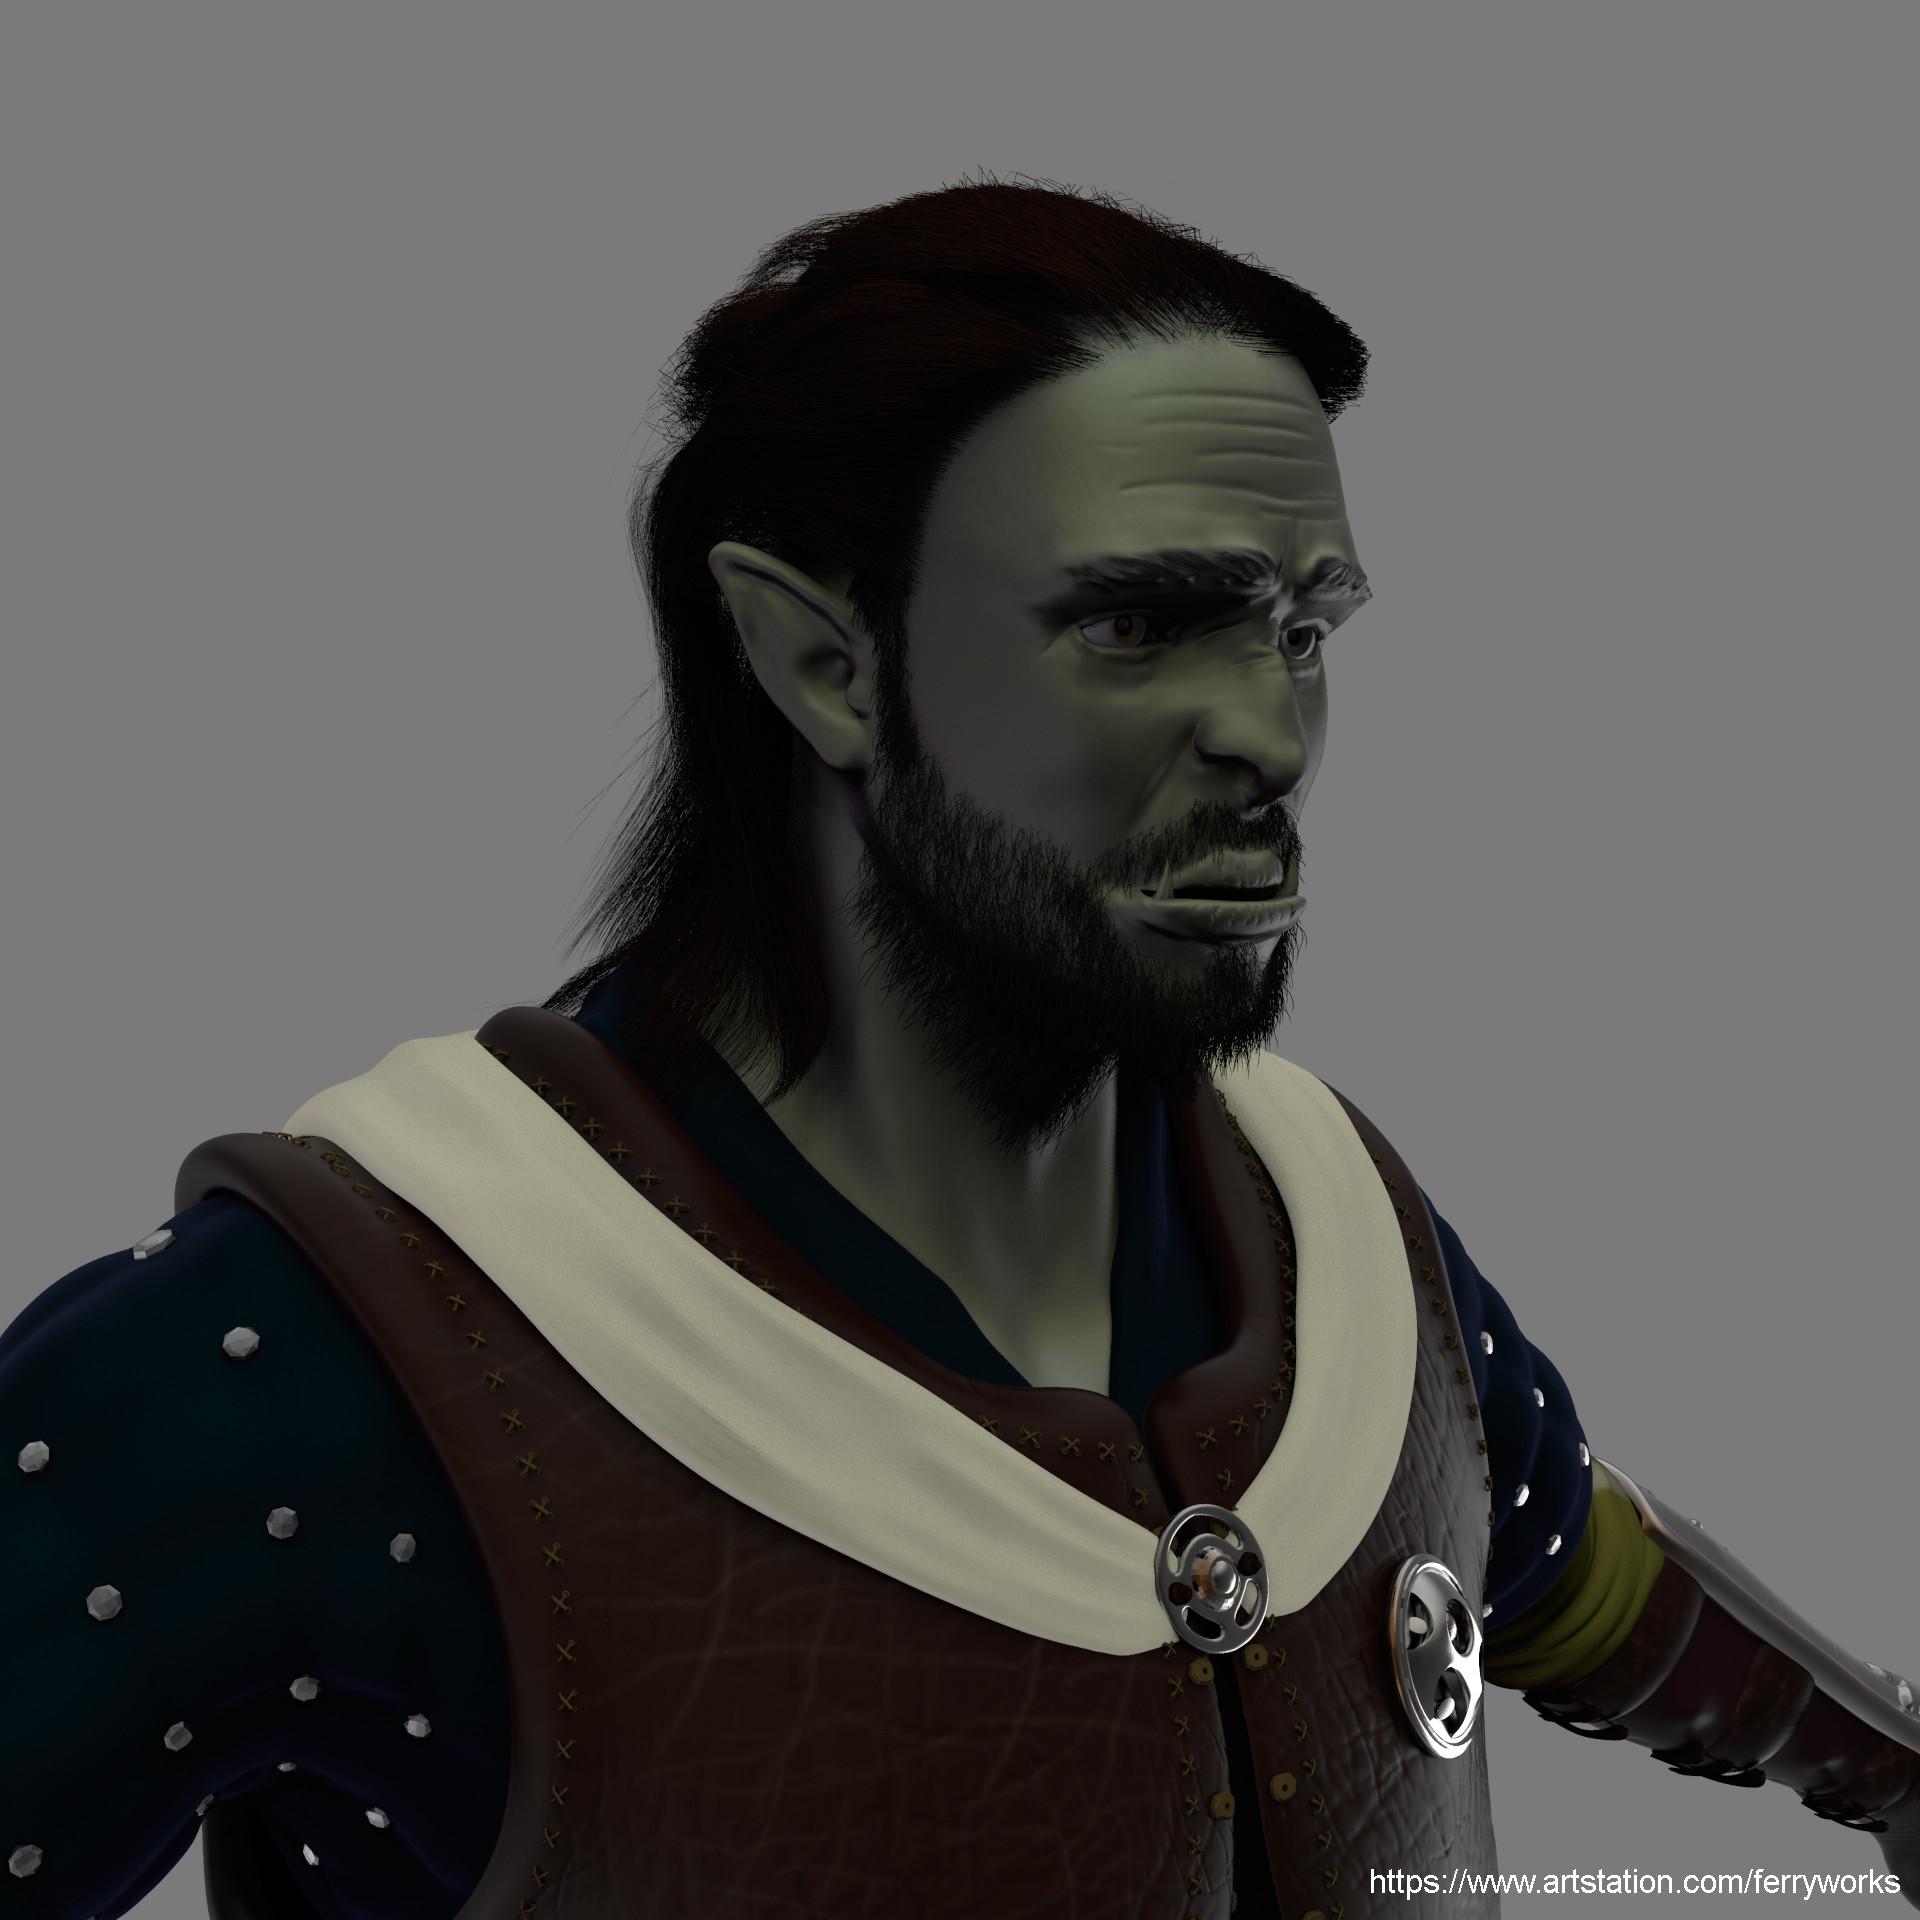 ArtStation - Half-Orc Cleric, Felipe Echeverry